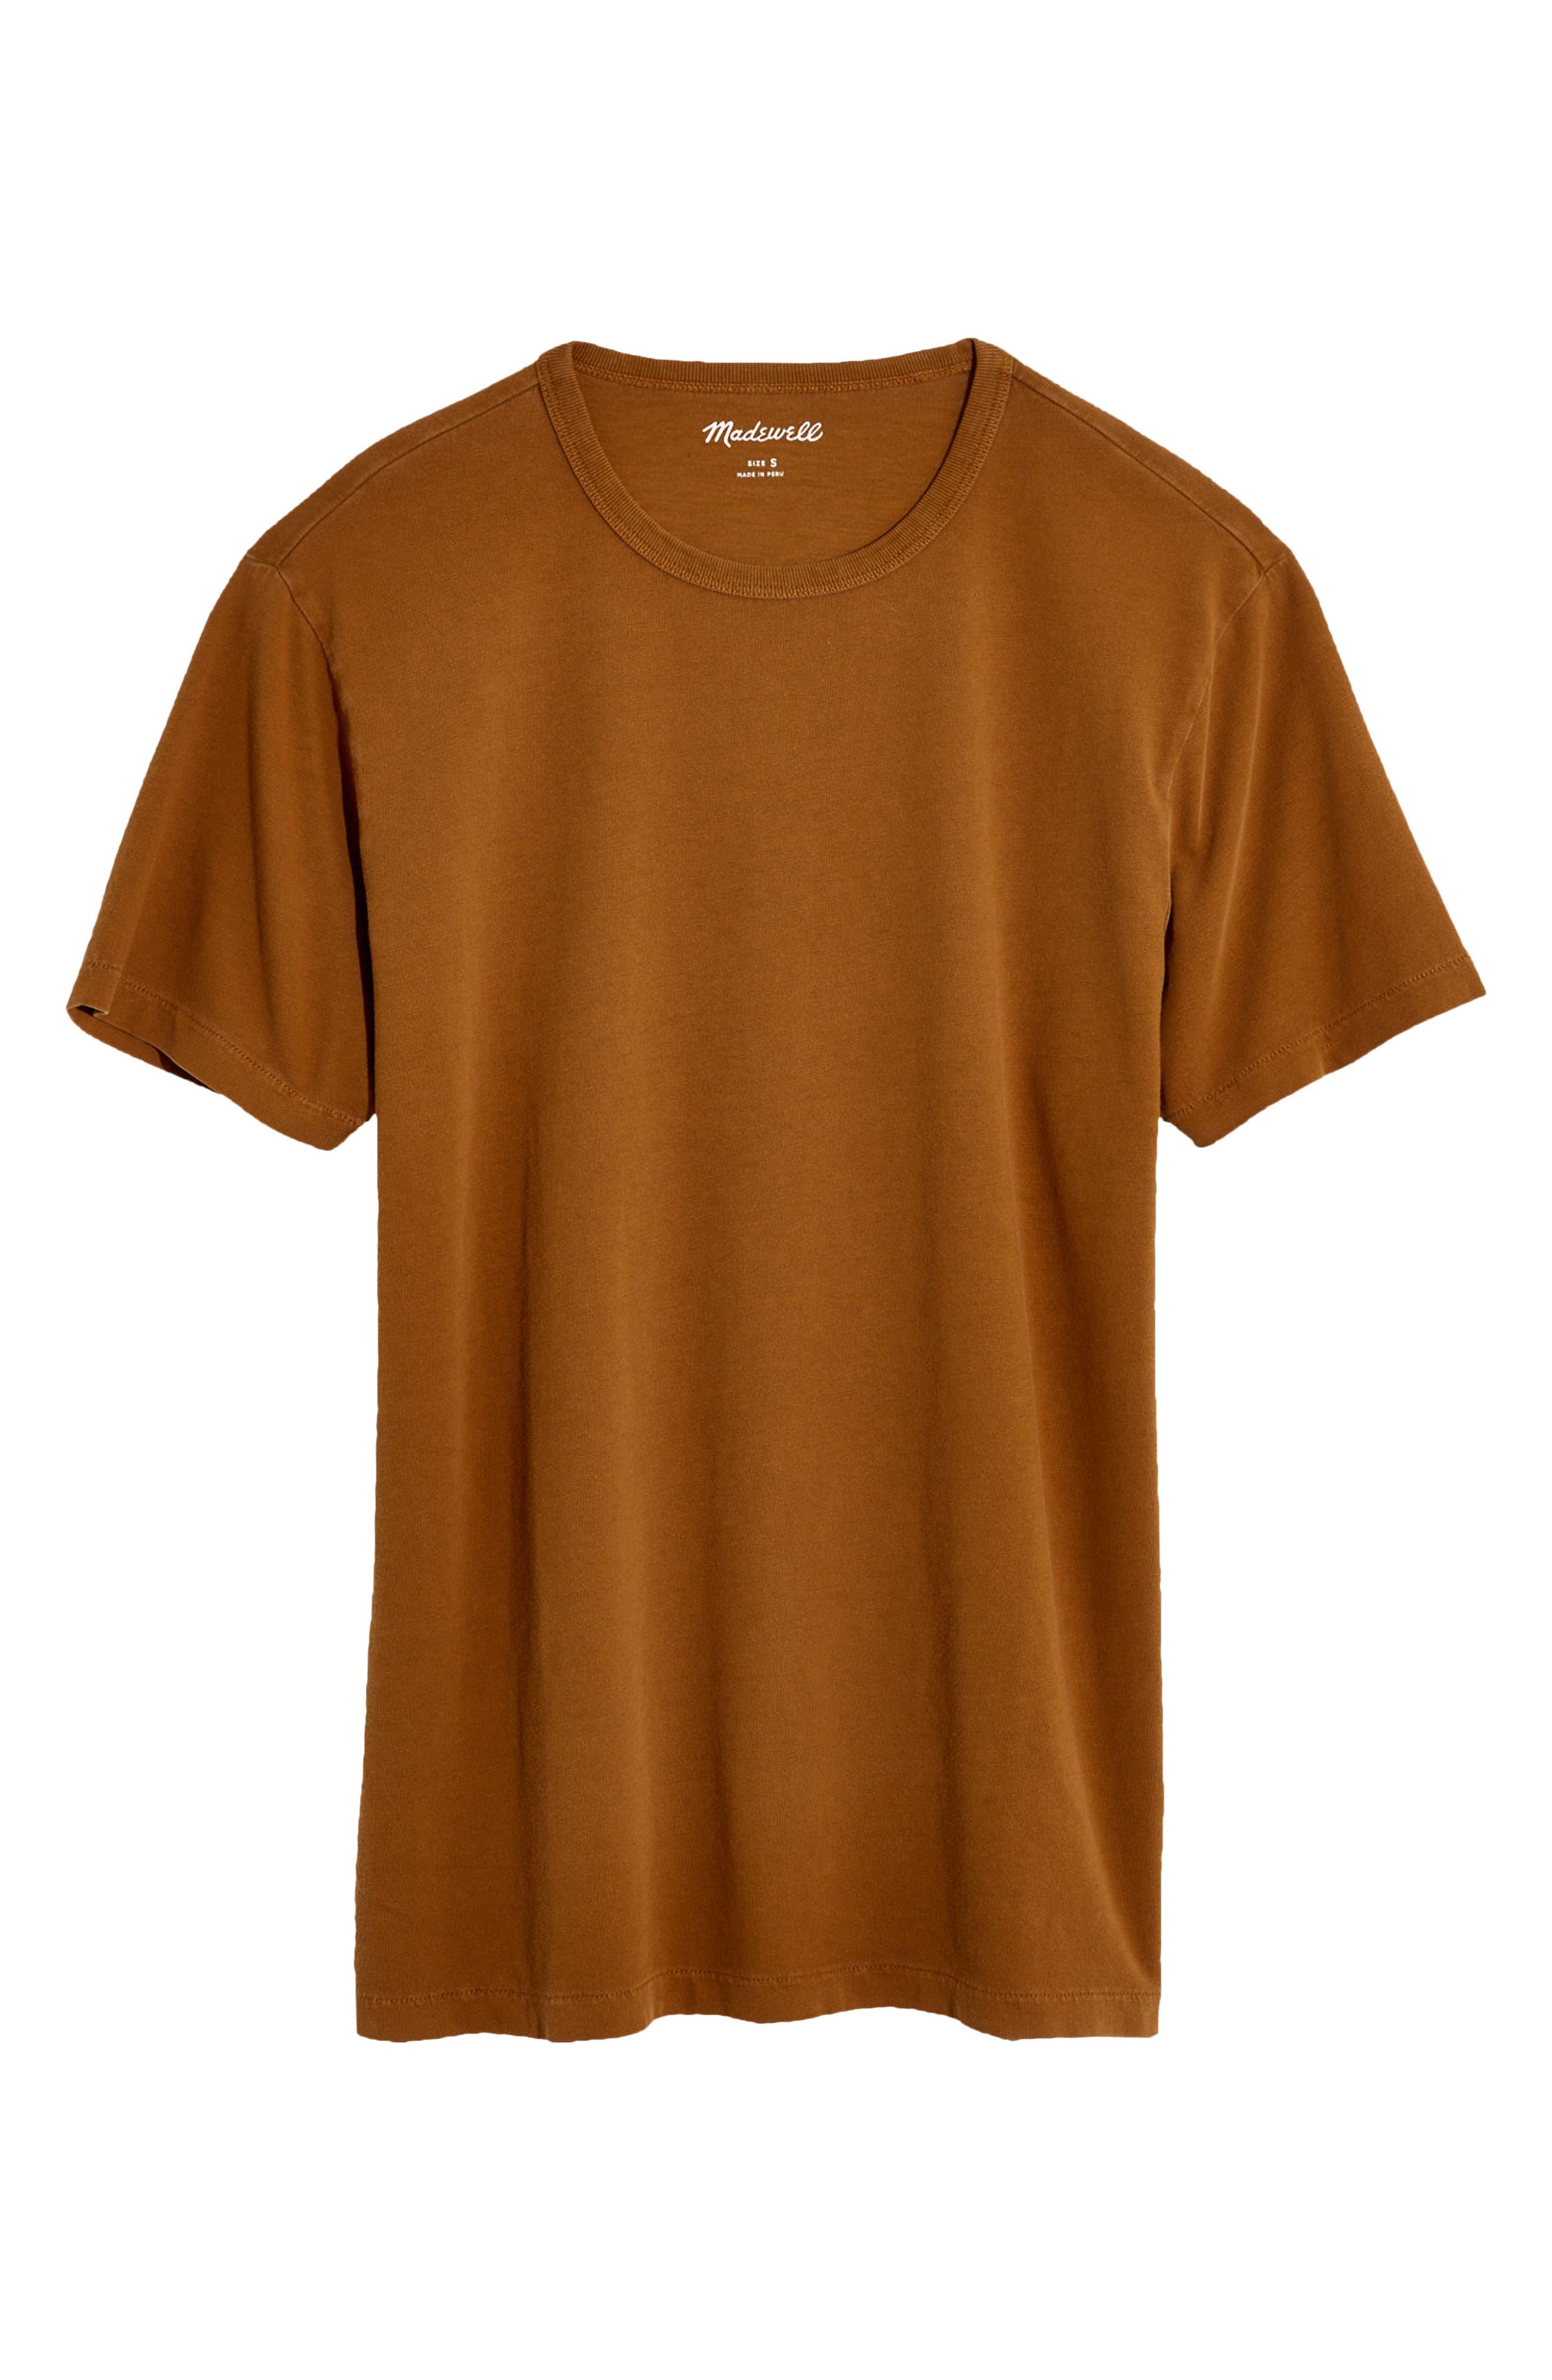 Garment Dyed Allday Crewneck T-Shirt